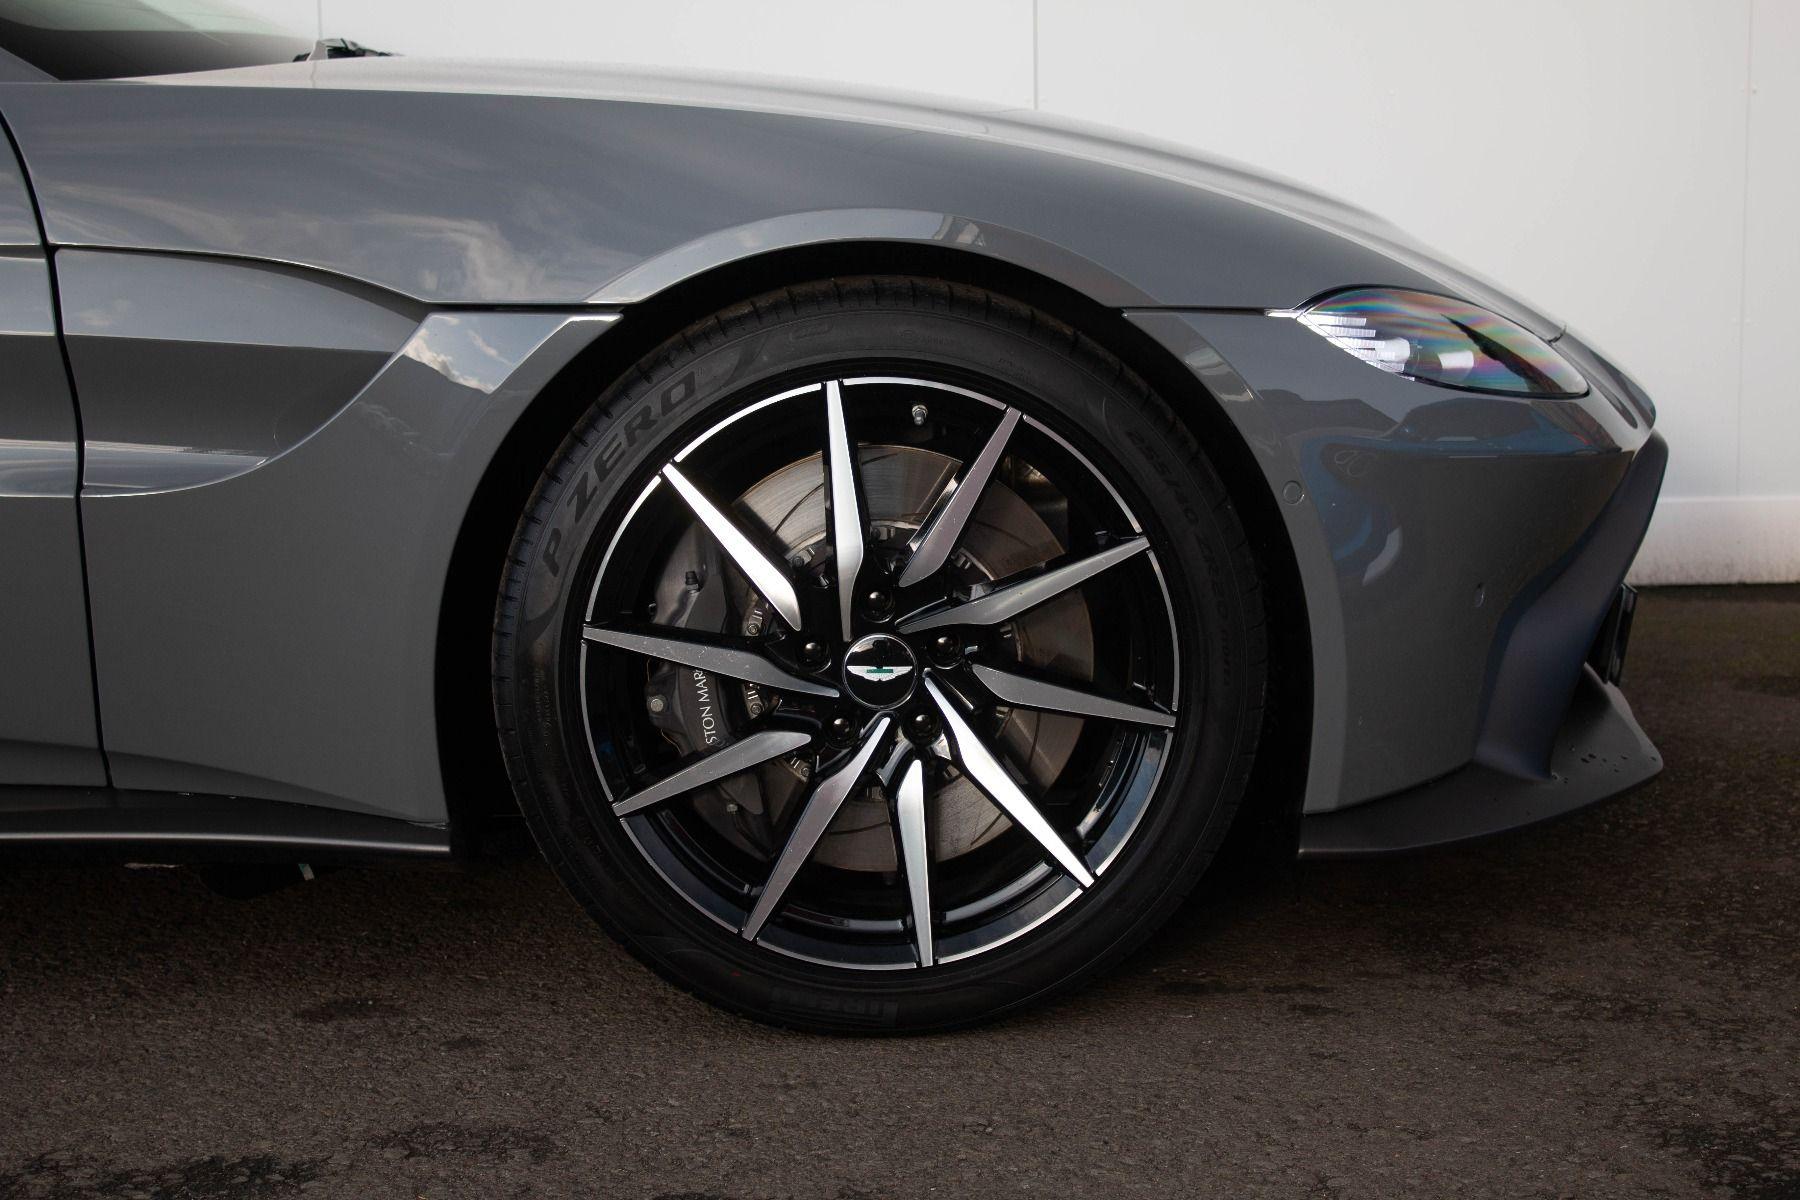 Aston Martin V8 Vantage Coupe 2dr ZF 8 Speed image 4